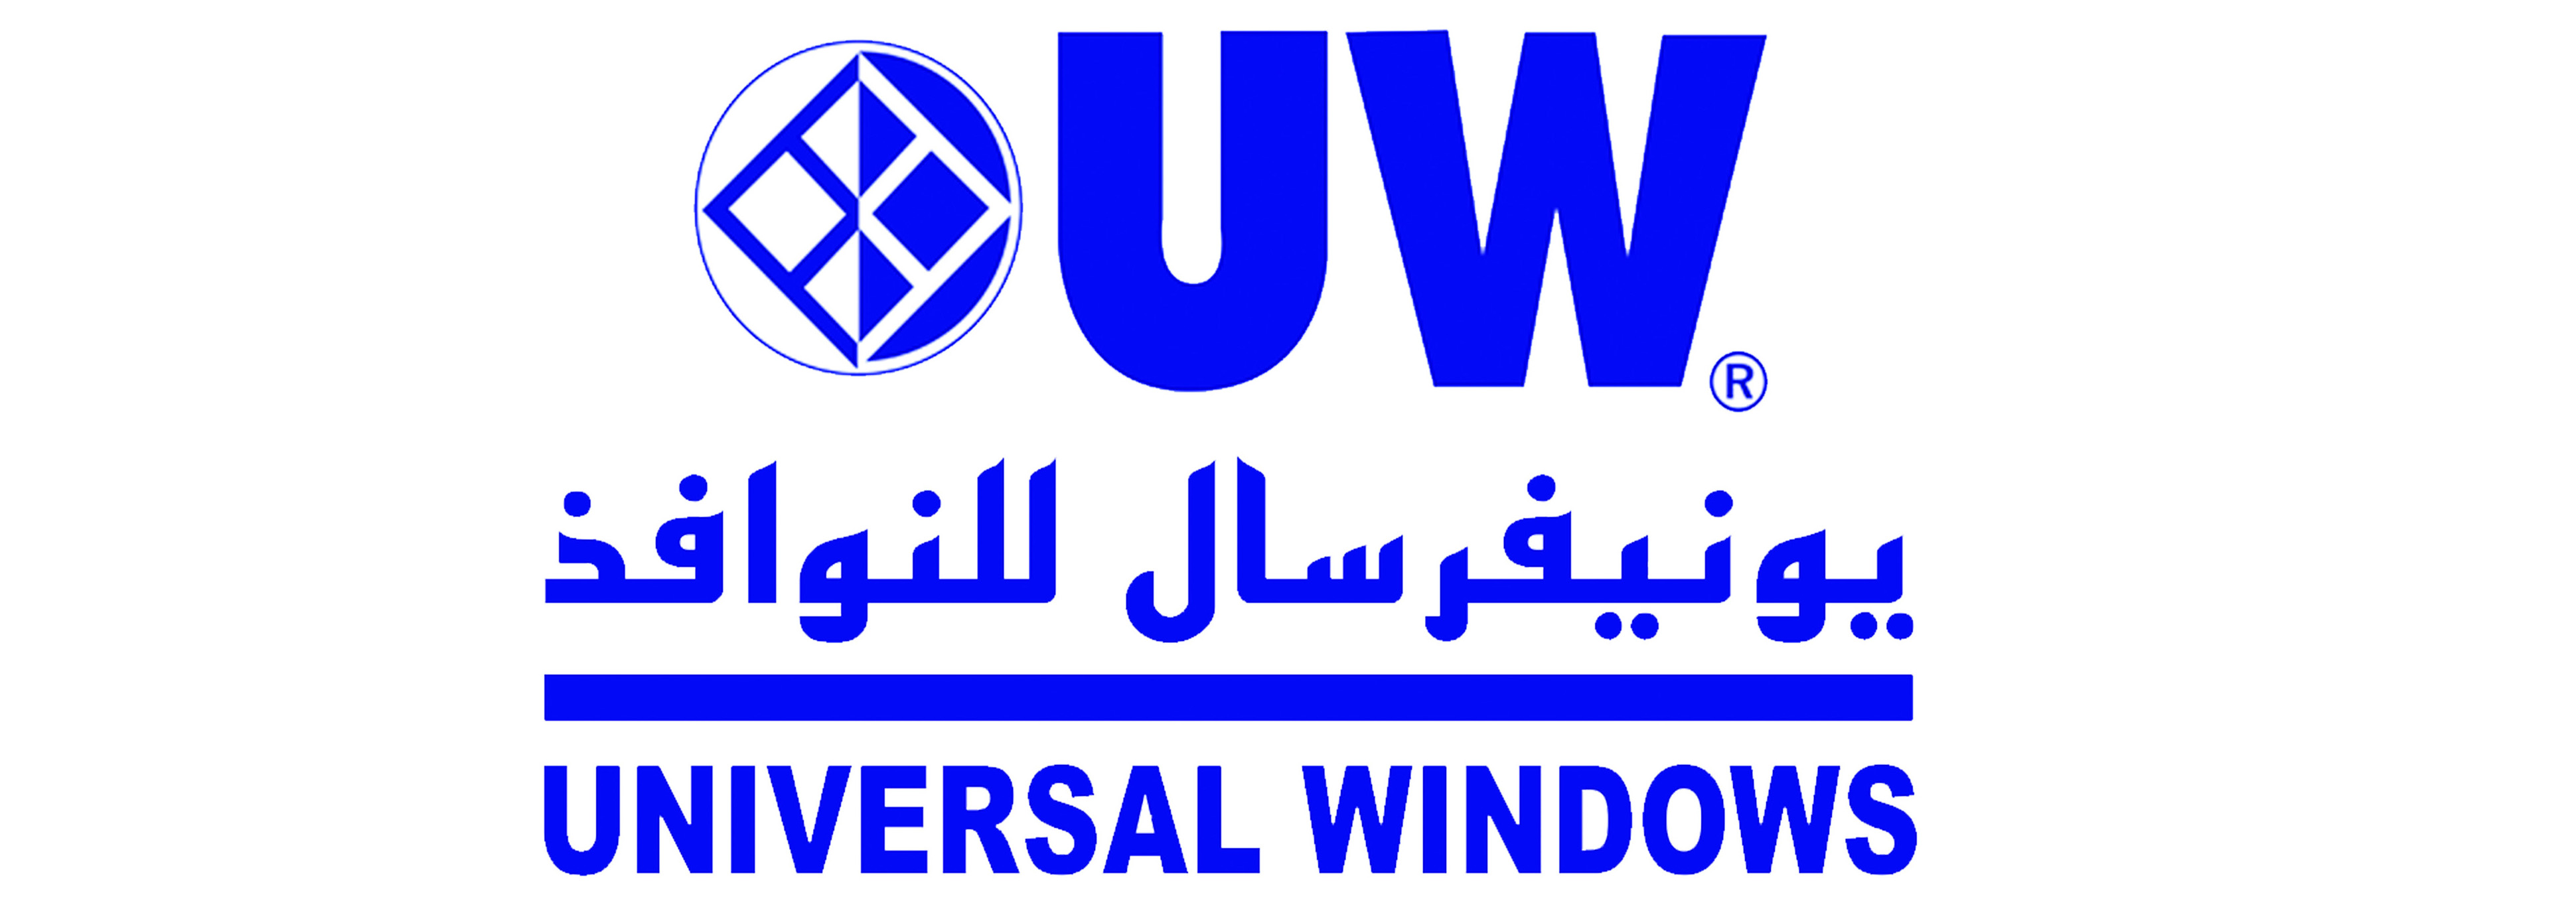 Universal Windows